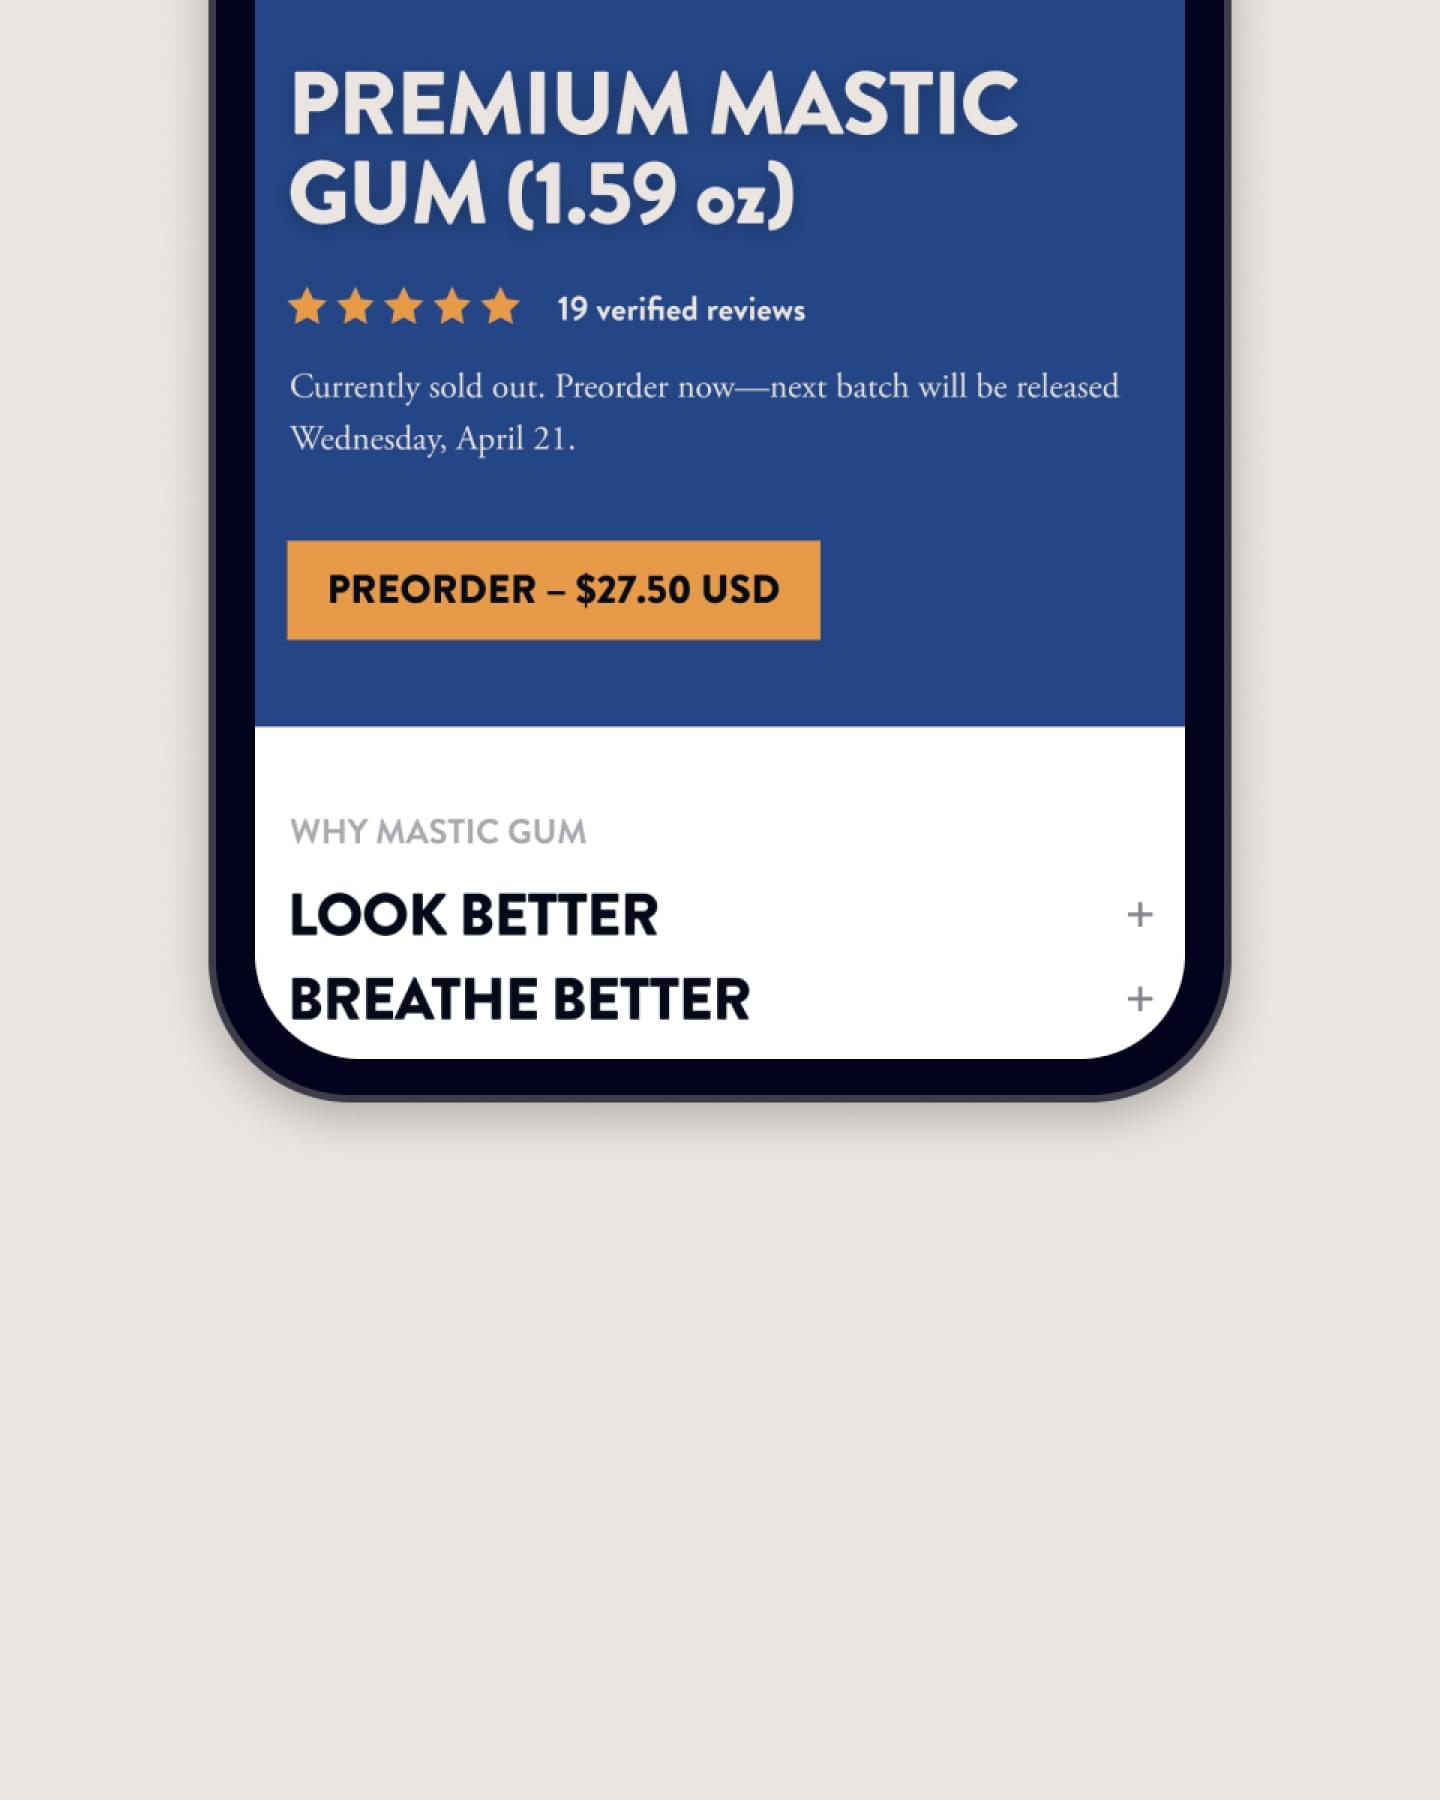 Mobile e-commerce website design for Greco Gum, natural health brand